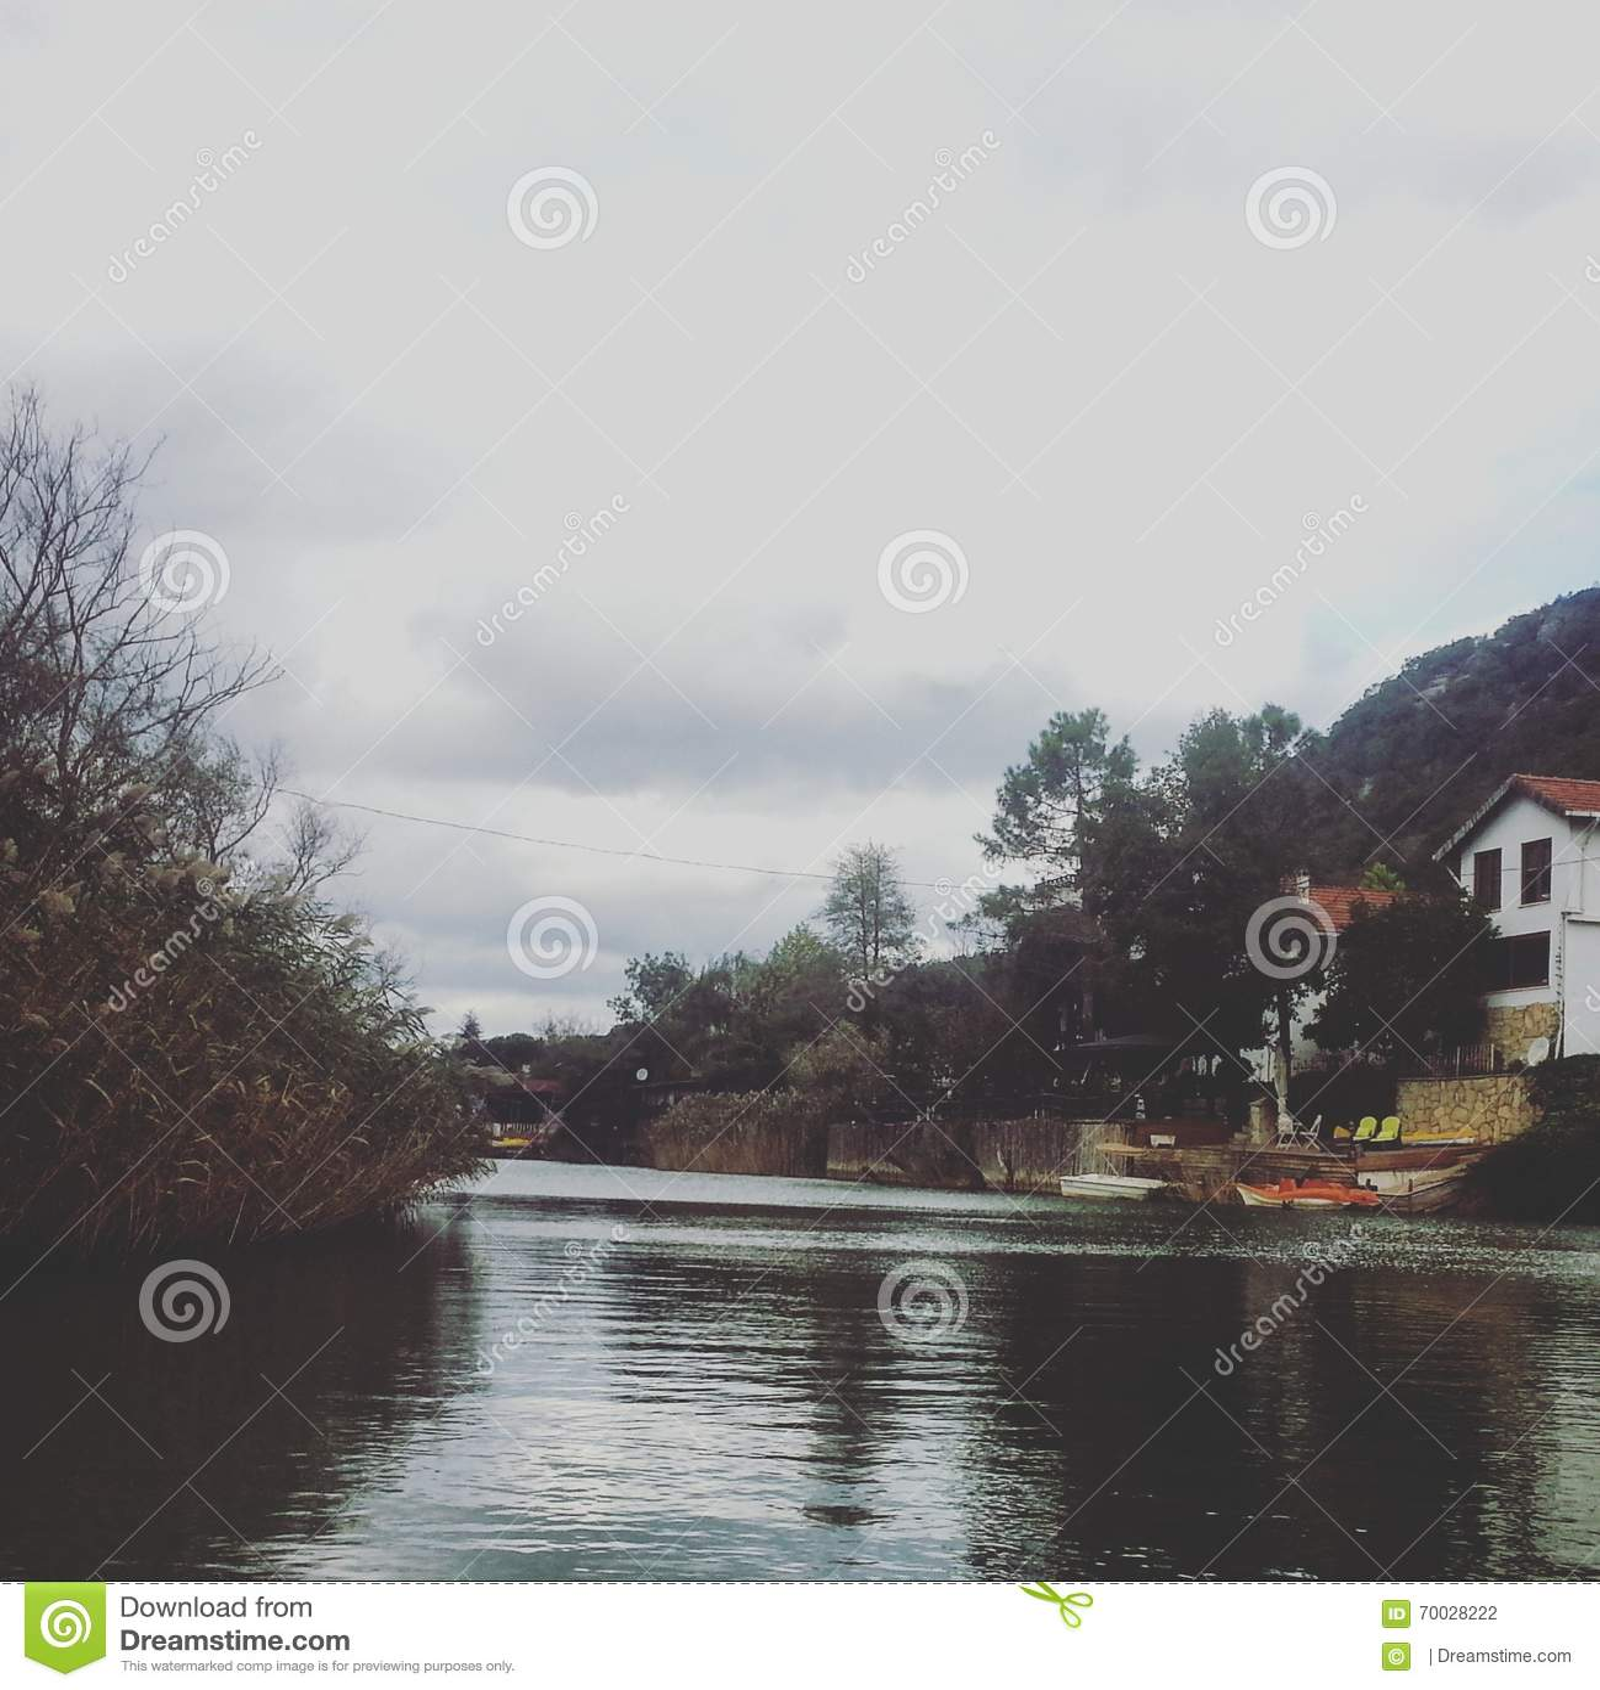 Rest on the river Bityug in the Voronezh region 58